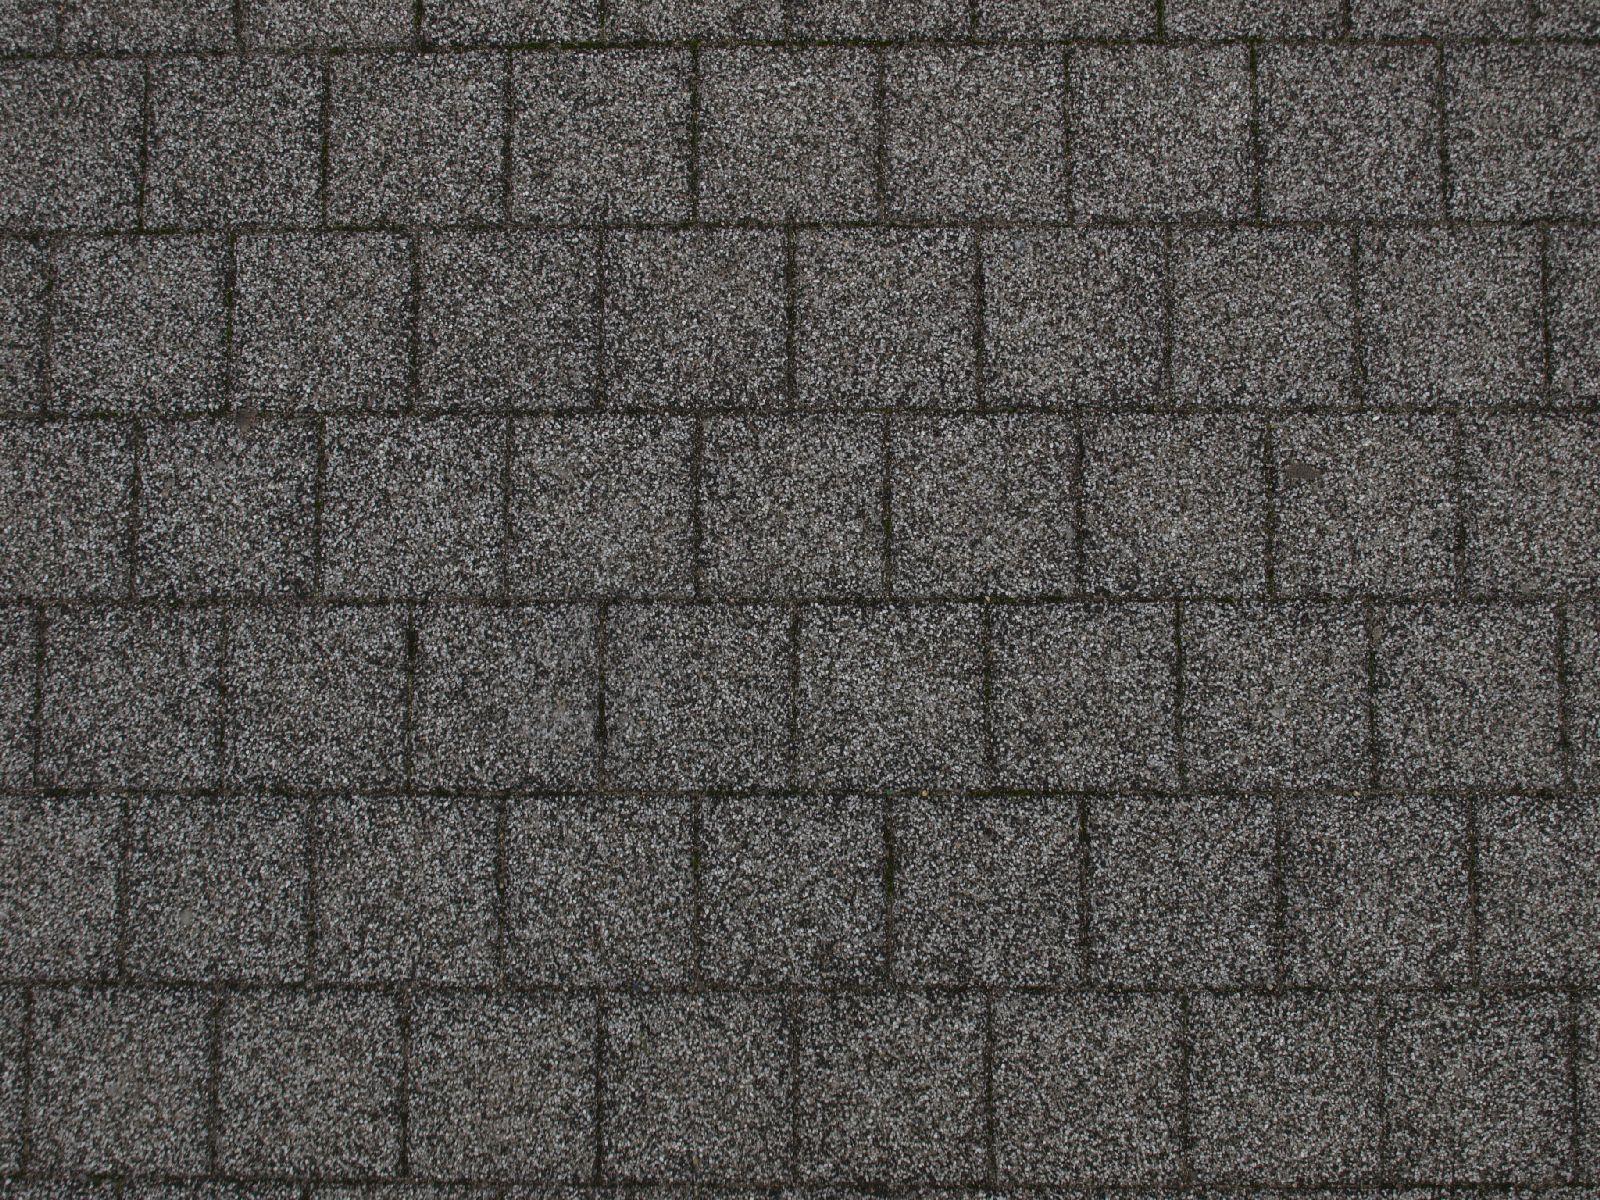 Ground-Urban_Texture_A_PC011333